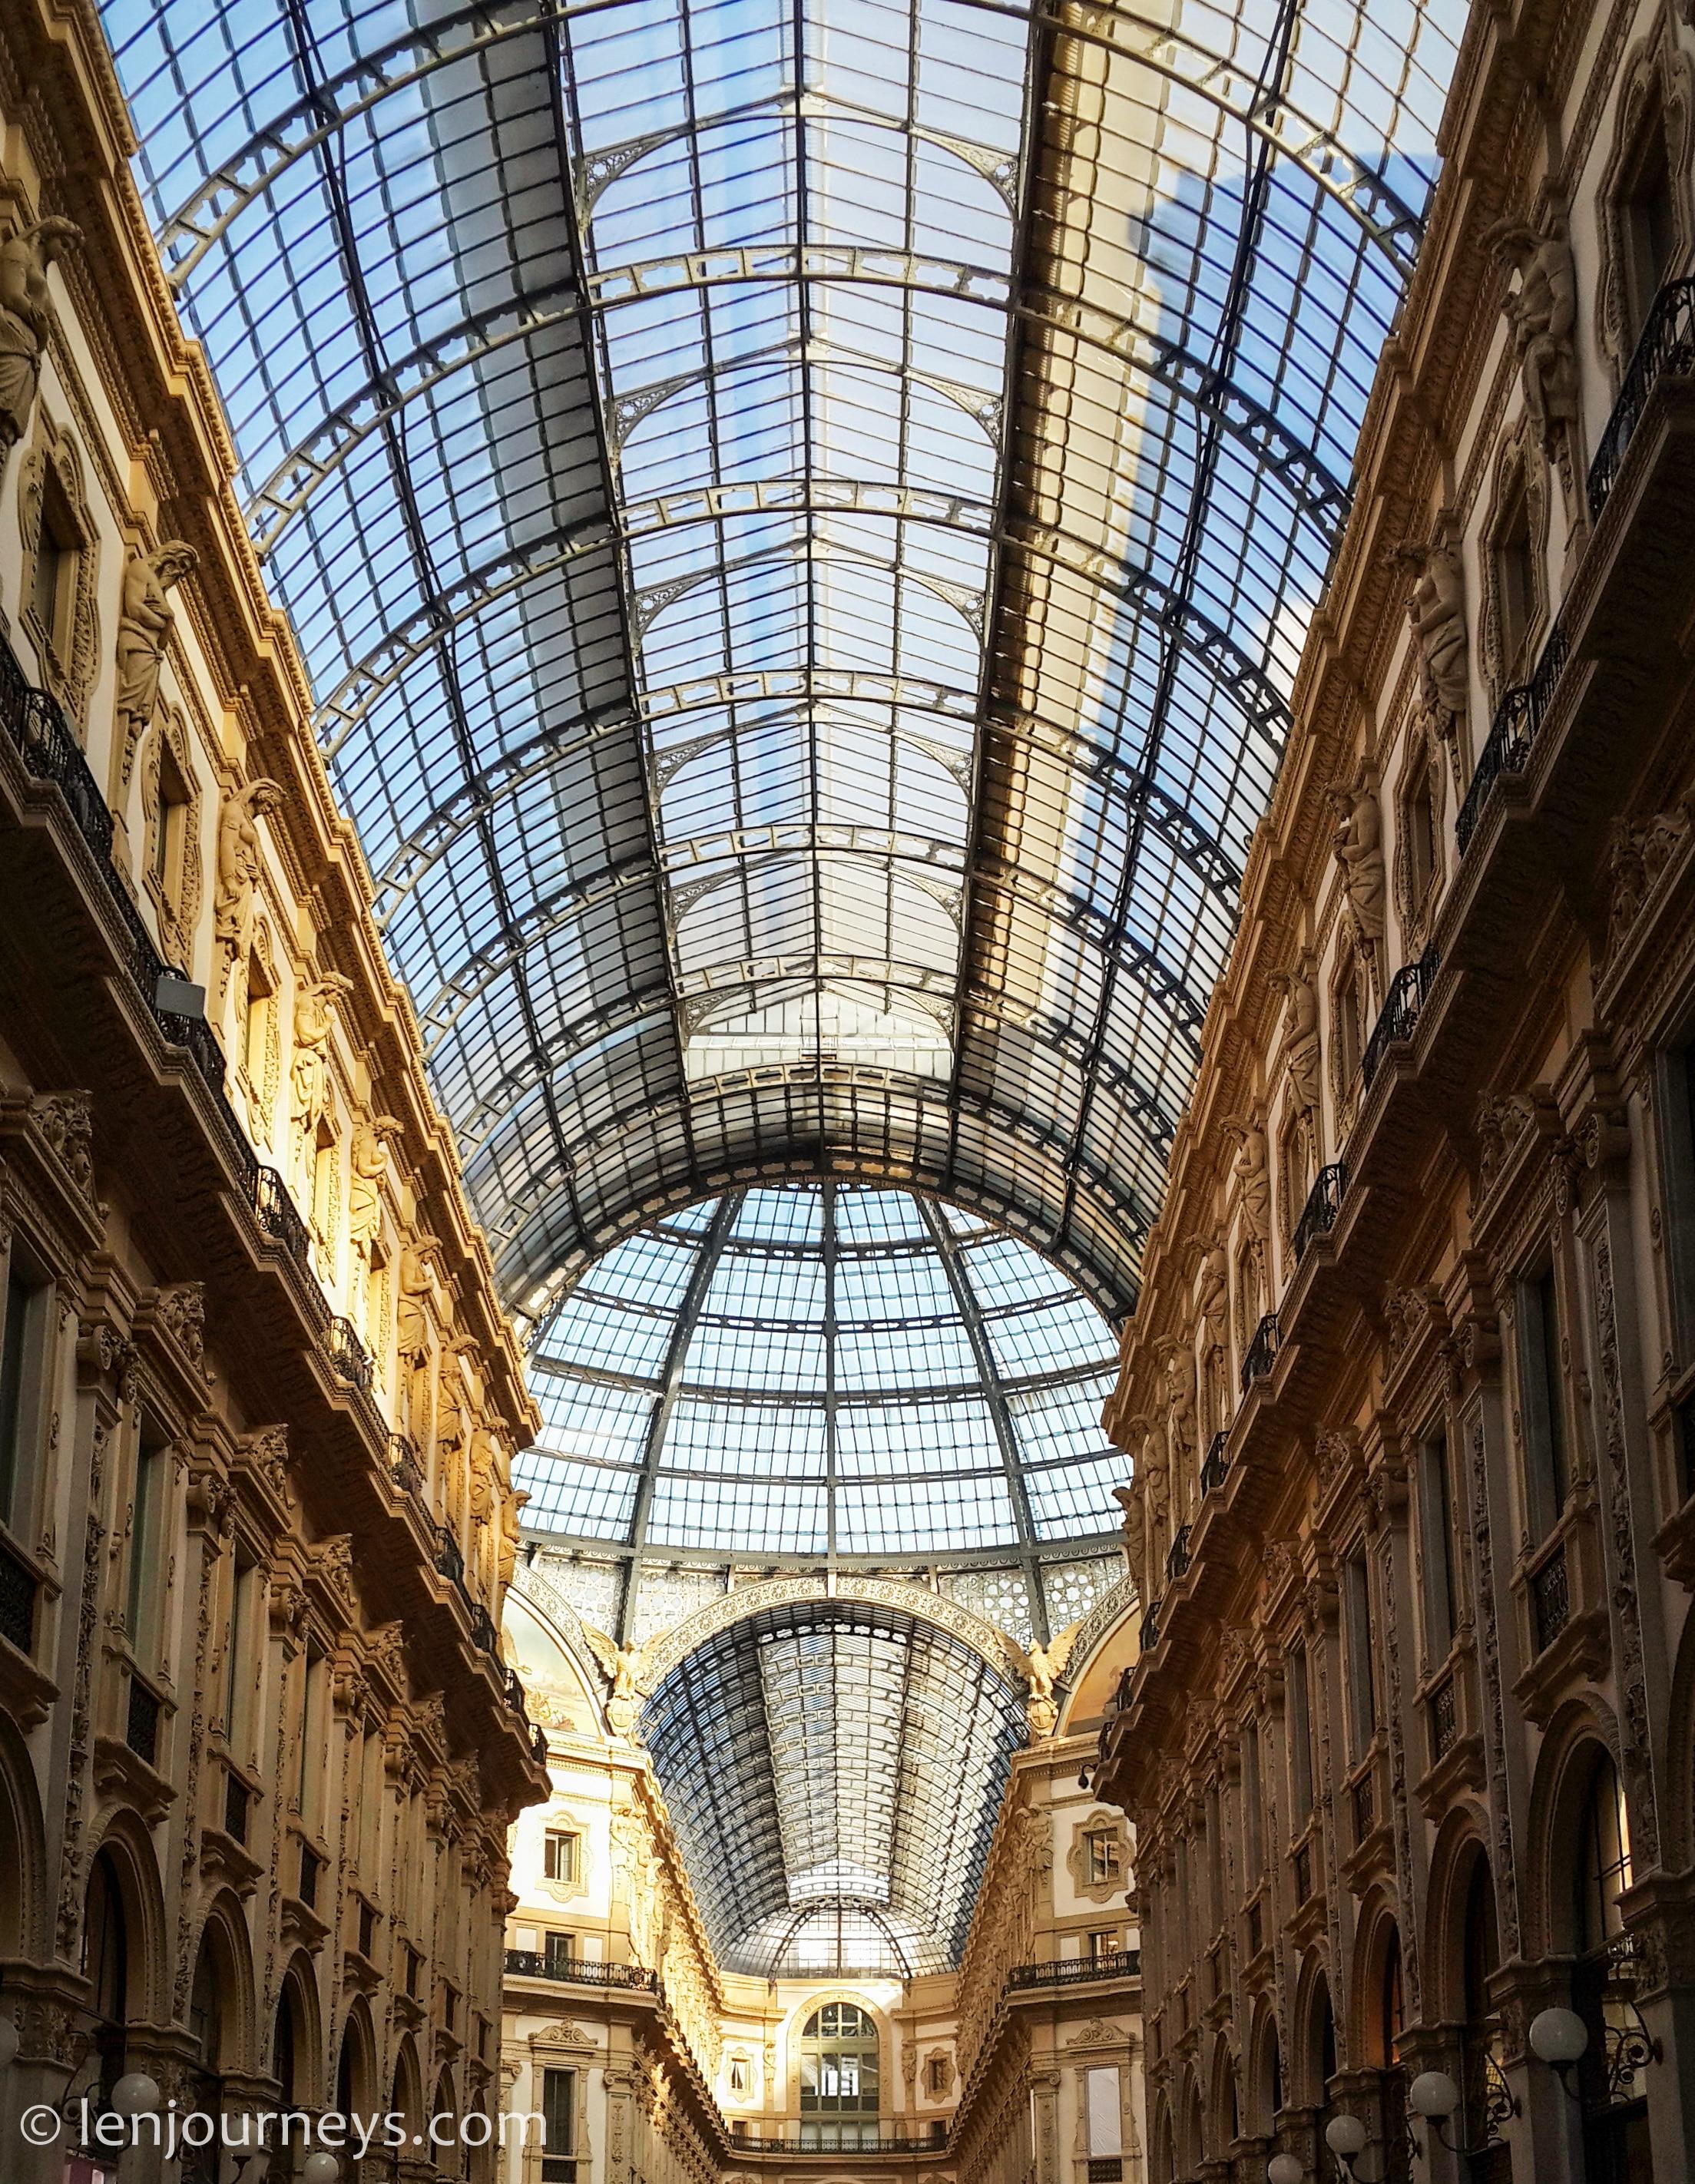 The glass roof of Galleria Vittorio Emanuele II